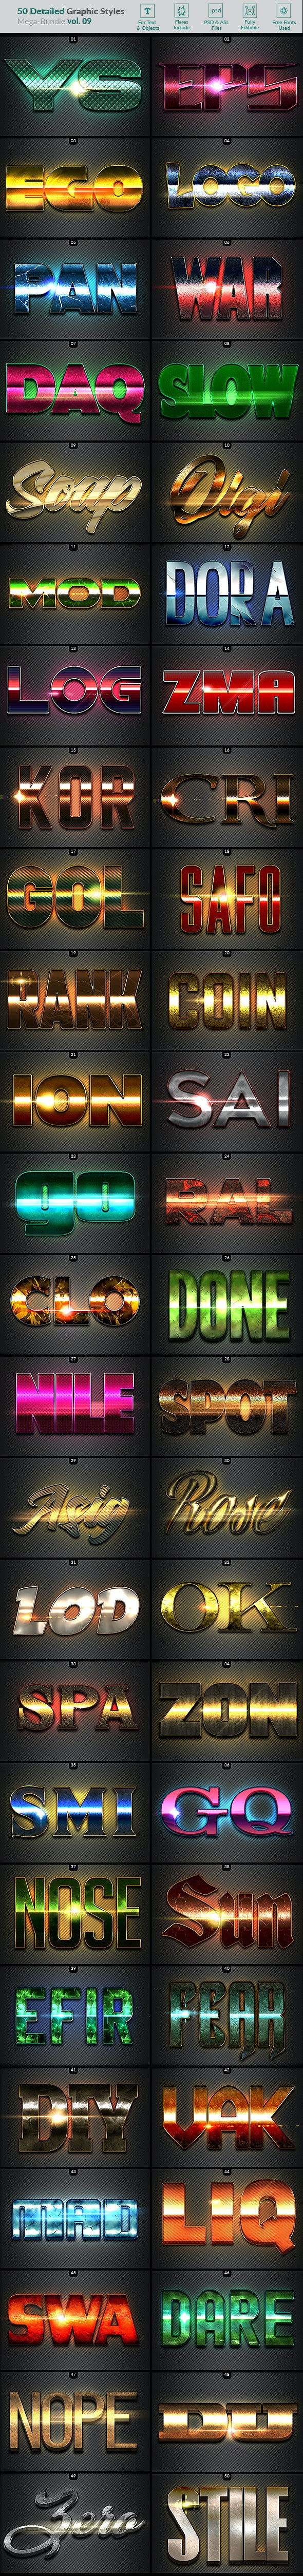 50 Text Effects - Bundle Vol. 09 - Styles Photoshop